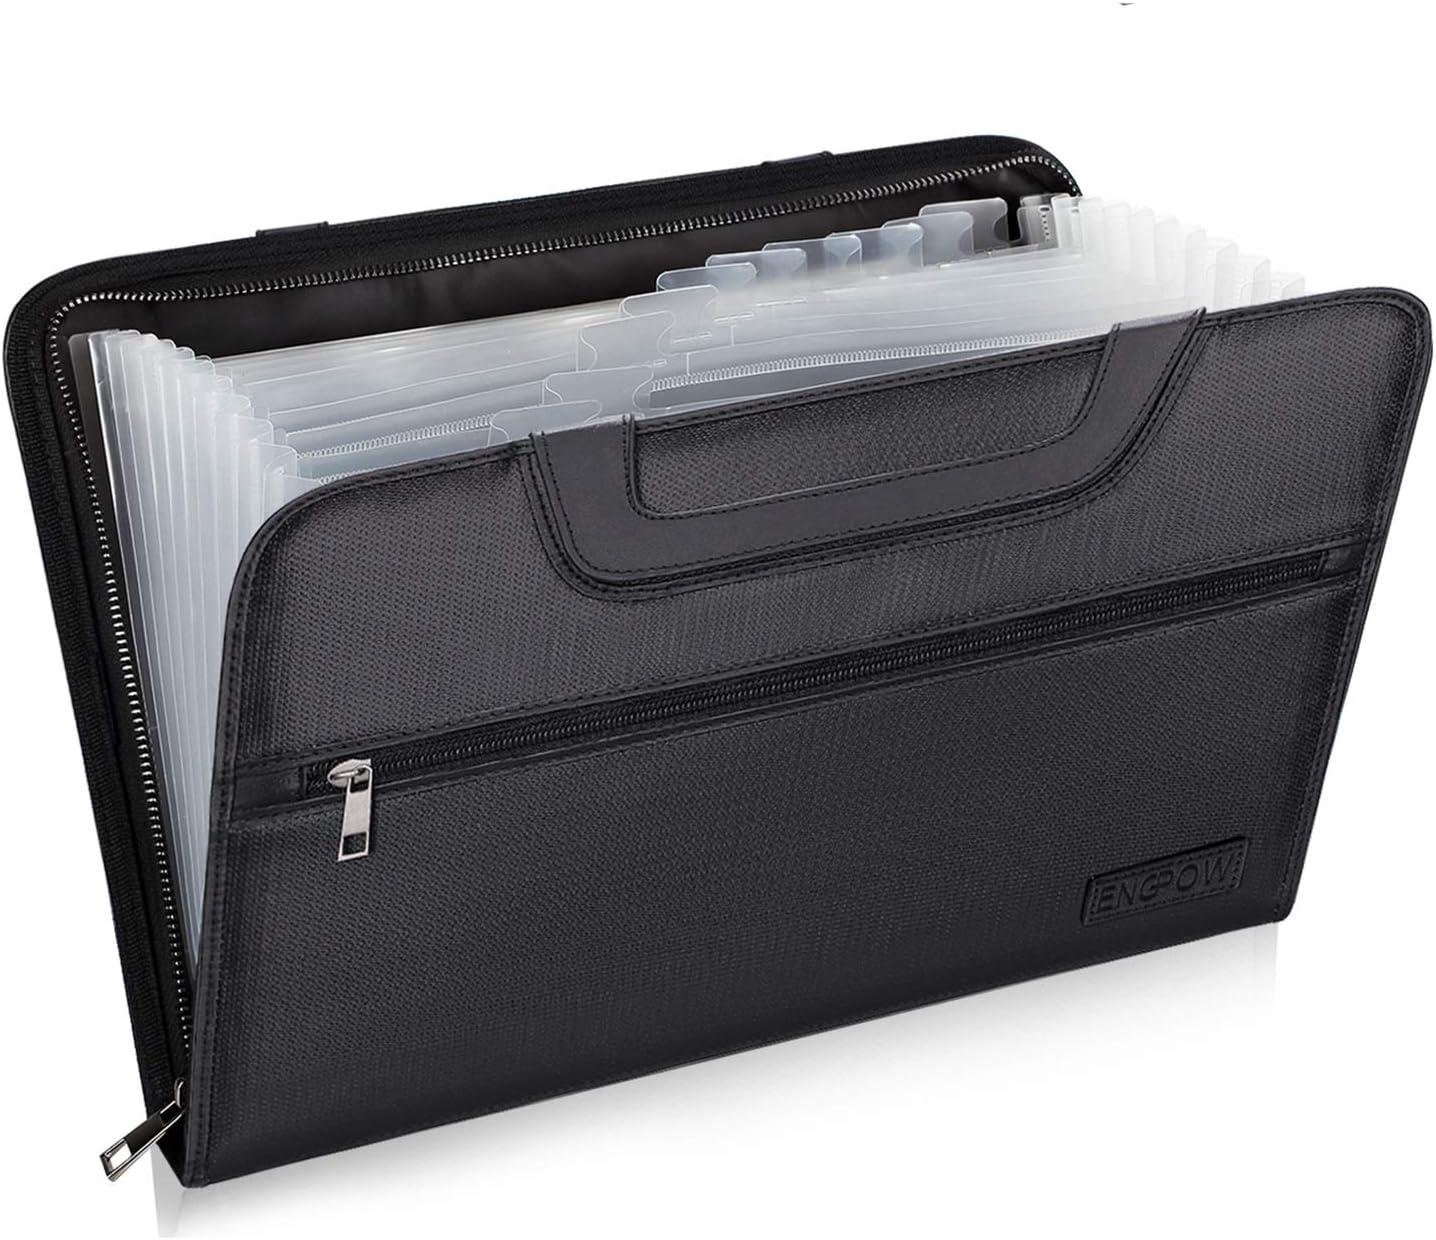 Portable A4 Accordion Expanding File Folder Bag Organizer with Zipper Handle